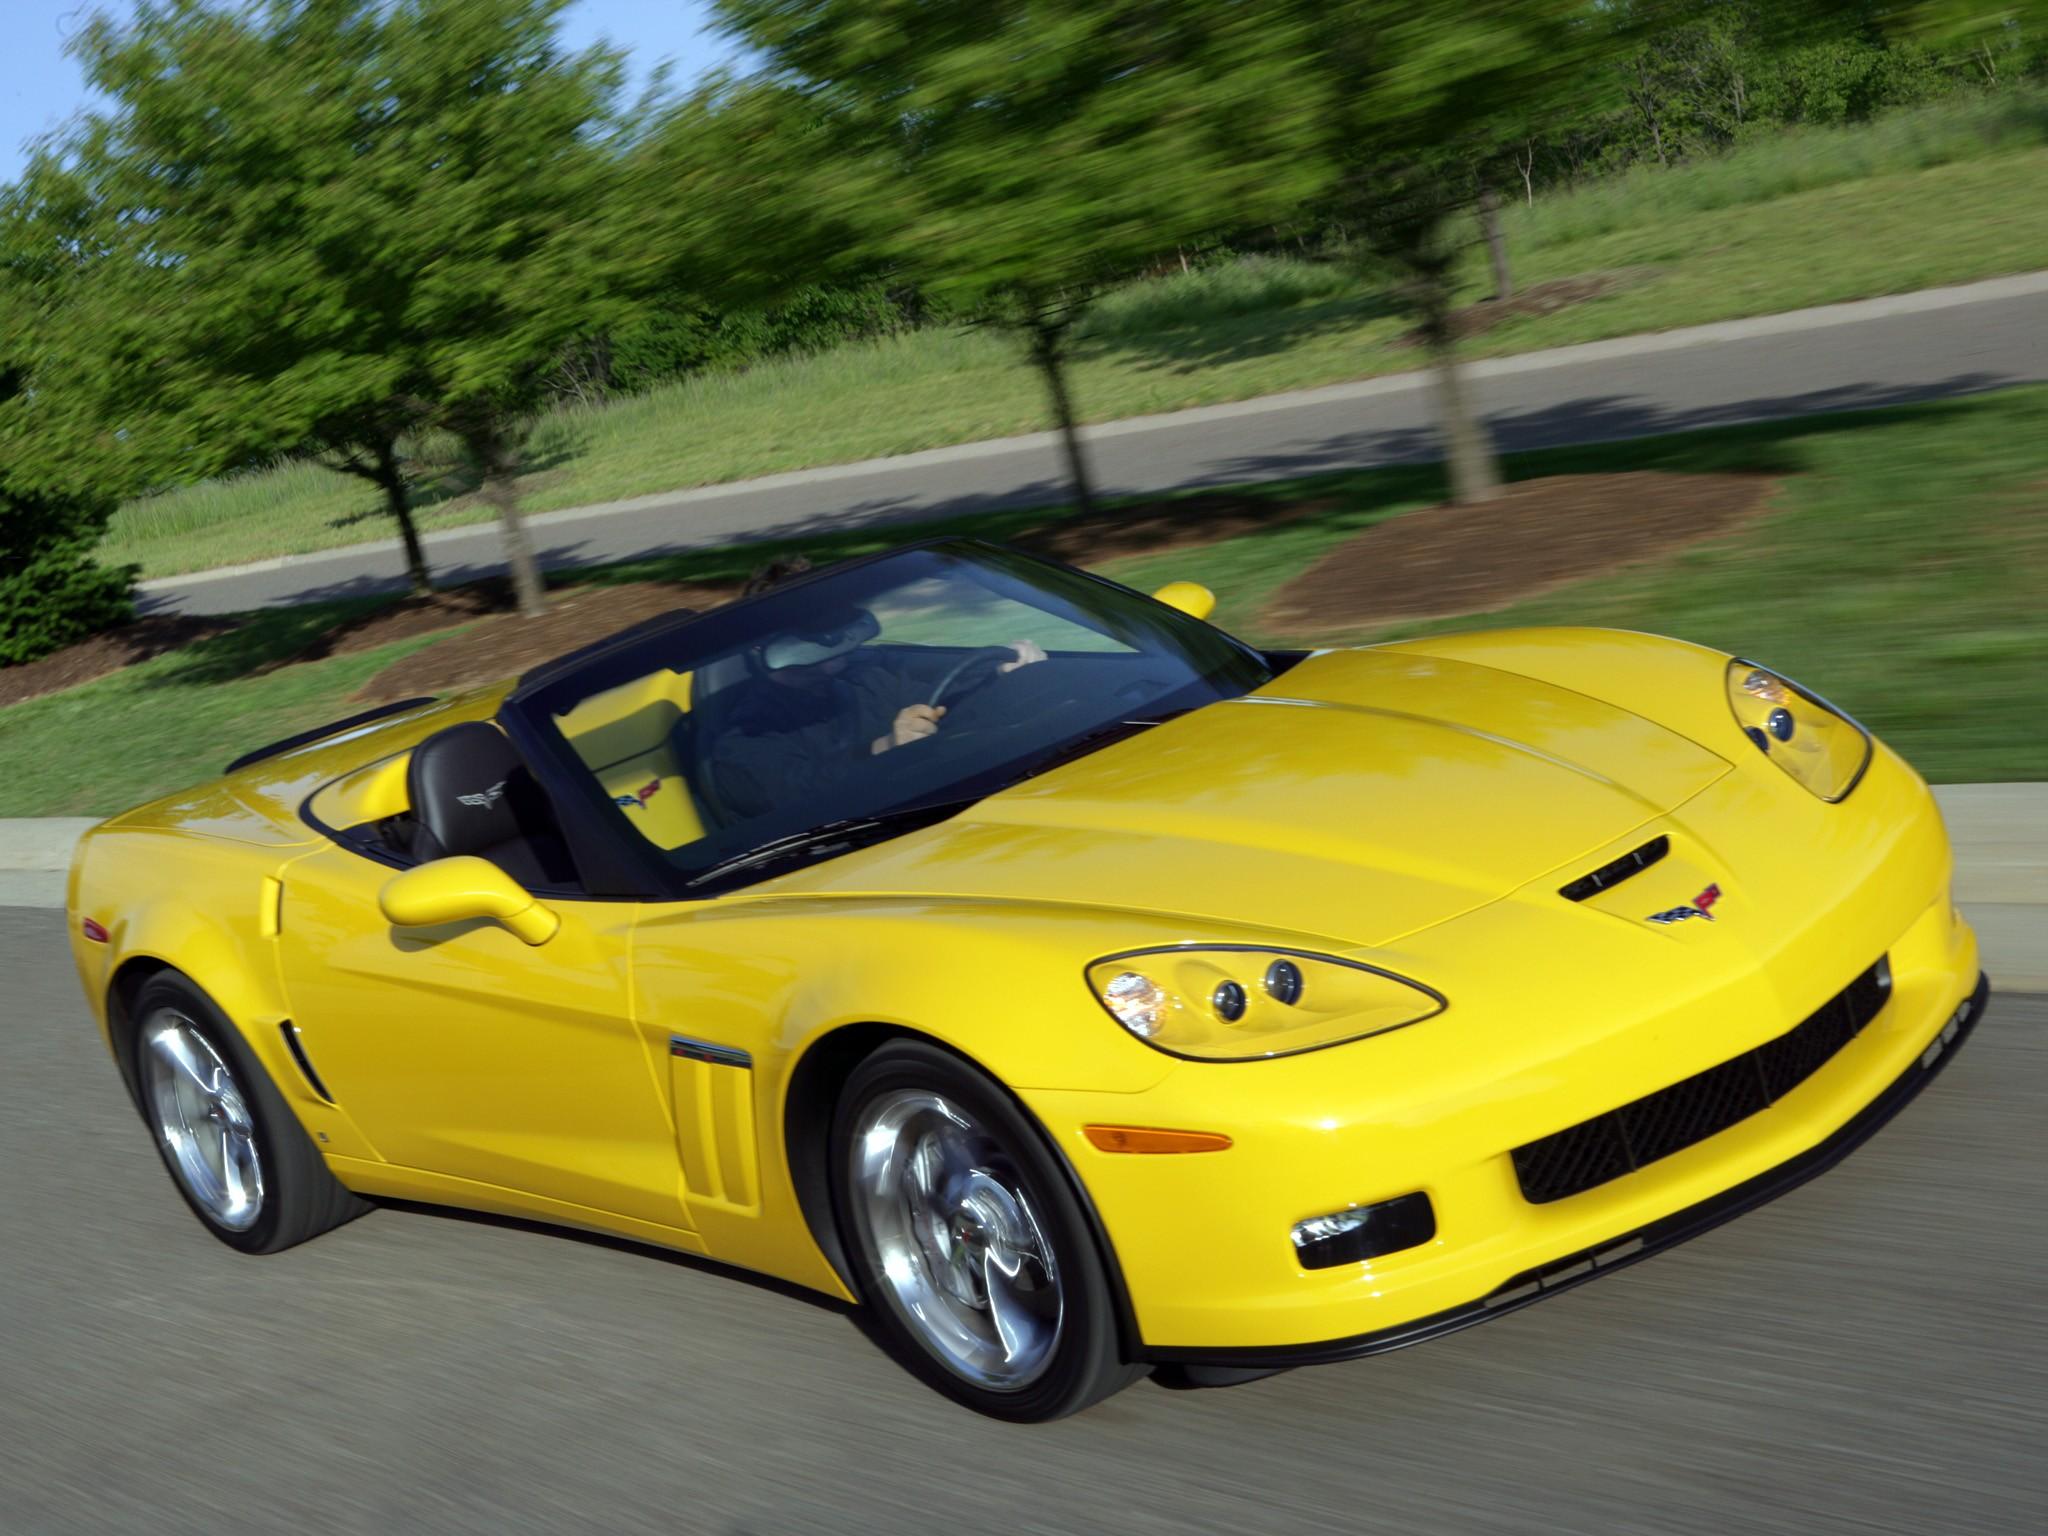 Chevrolet Corvette Convertible Grand Sport 2009 2010